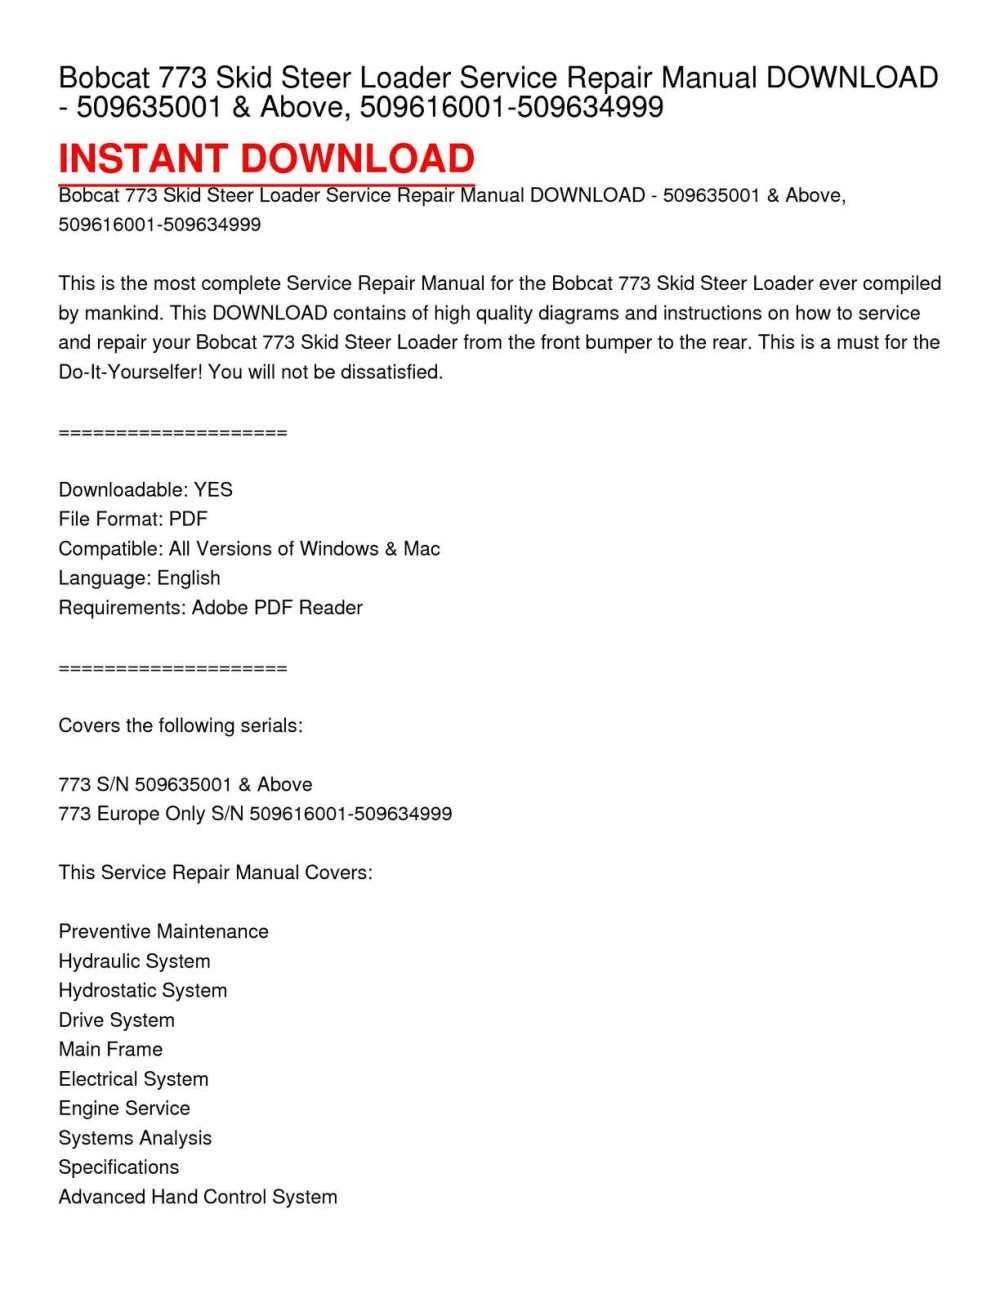 medium resolution of bobcat 773 skid steer loader service repair manual download 509635001 above 509616001 509634999